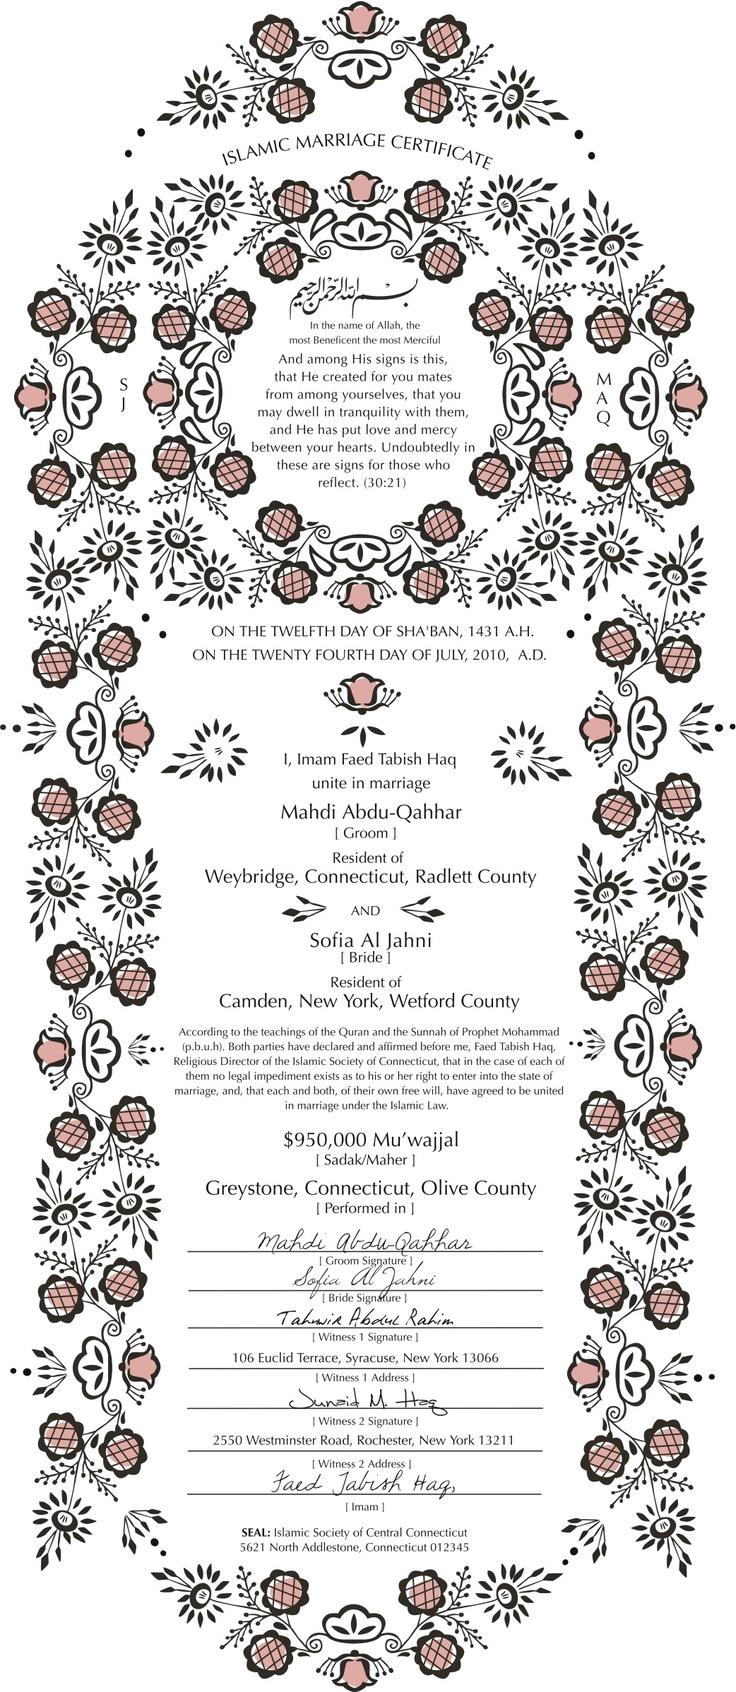 61 best certificate design images on pinterest certificate design nikkahanama islamic marriage certificate design example yelopaper Image collections